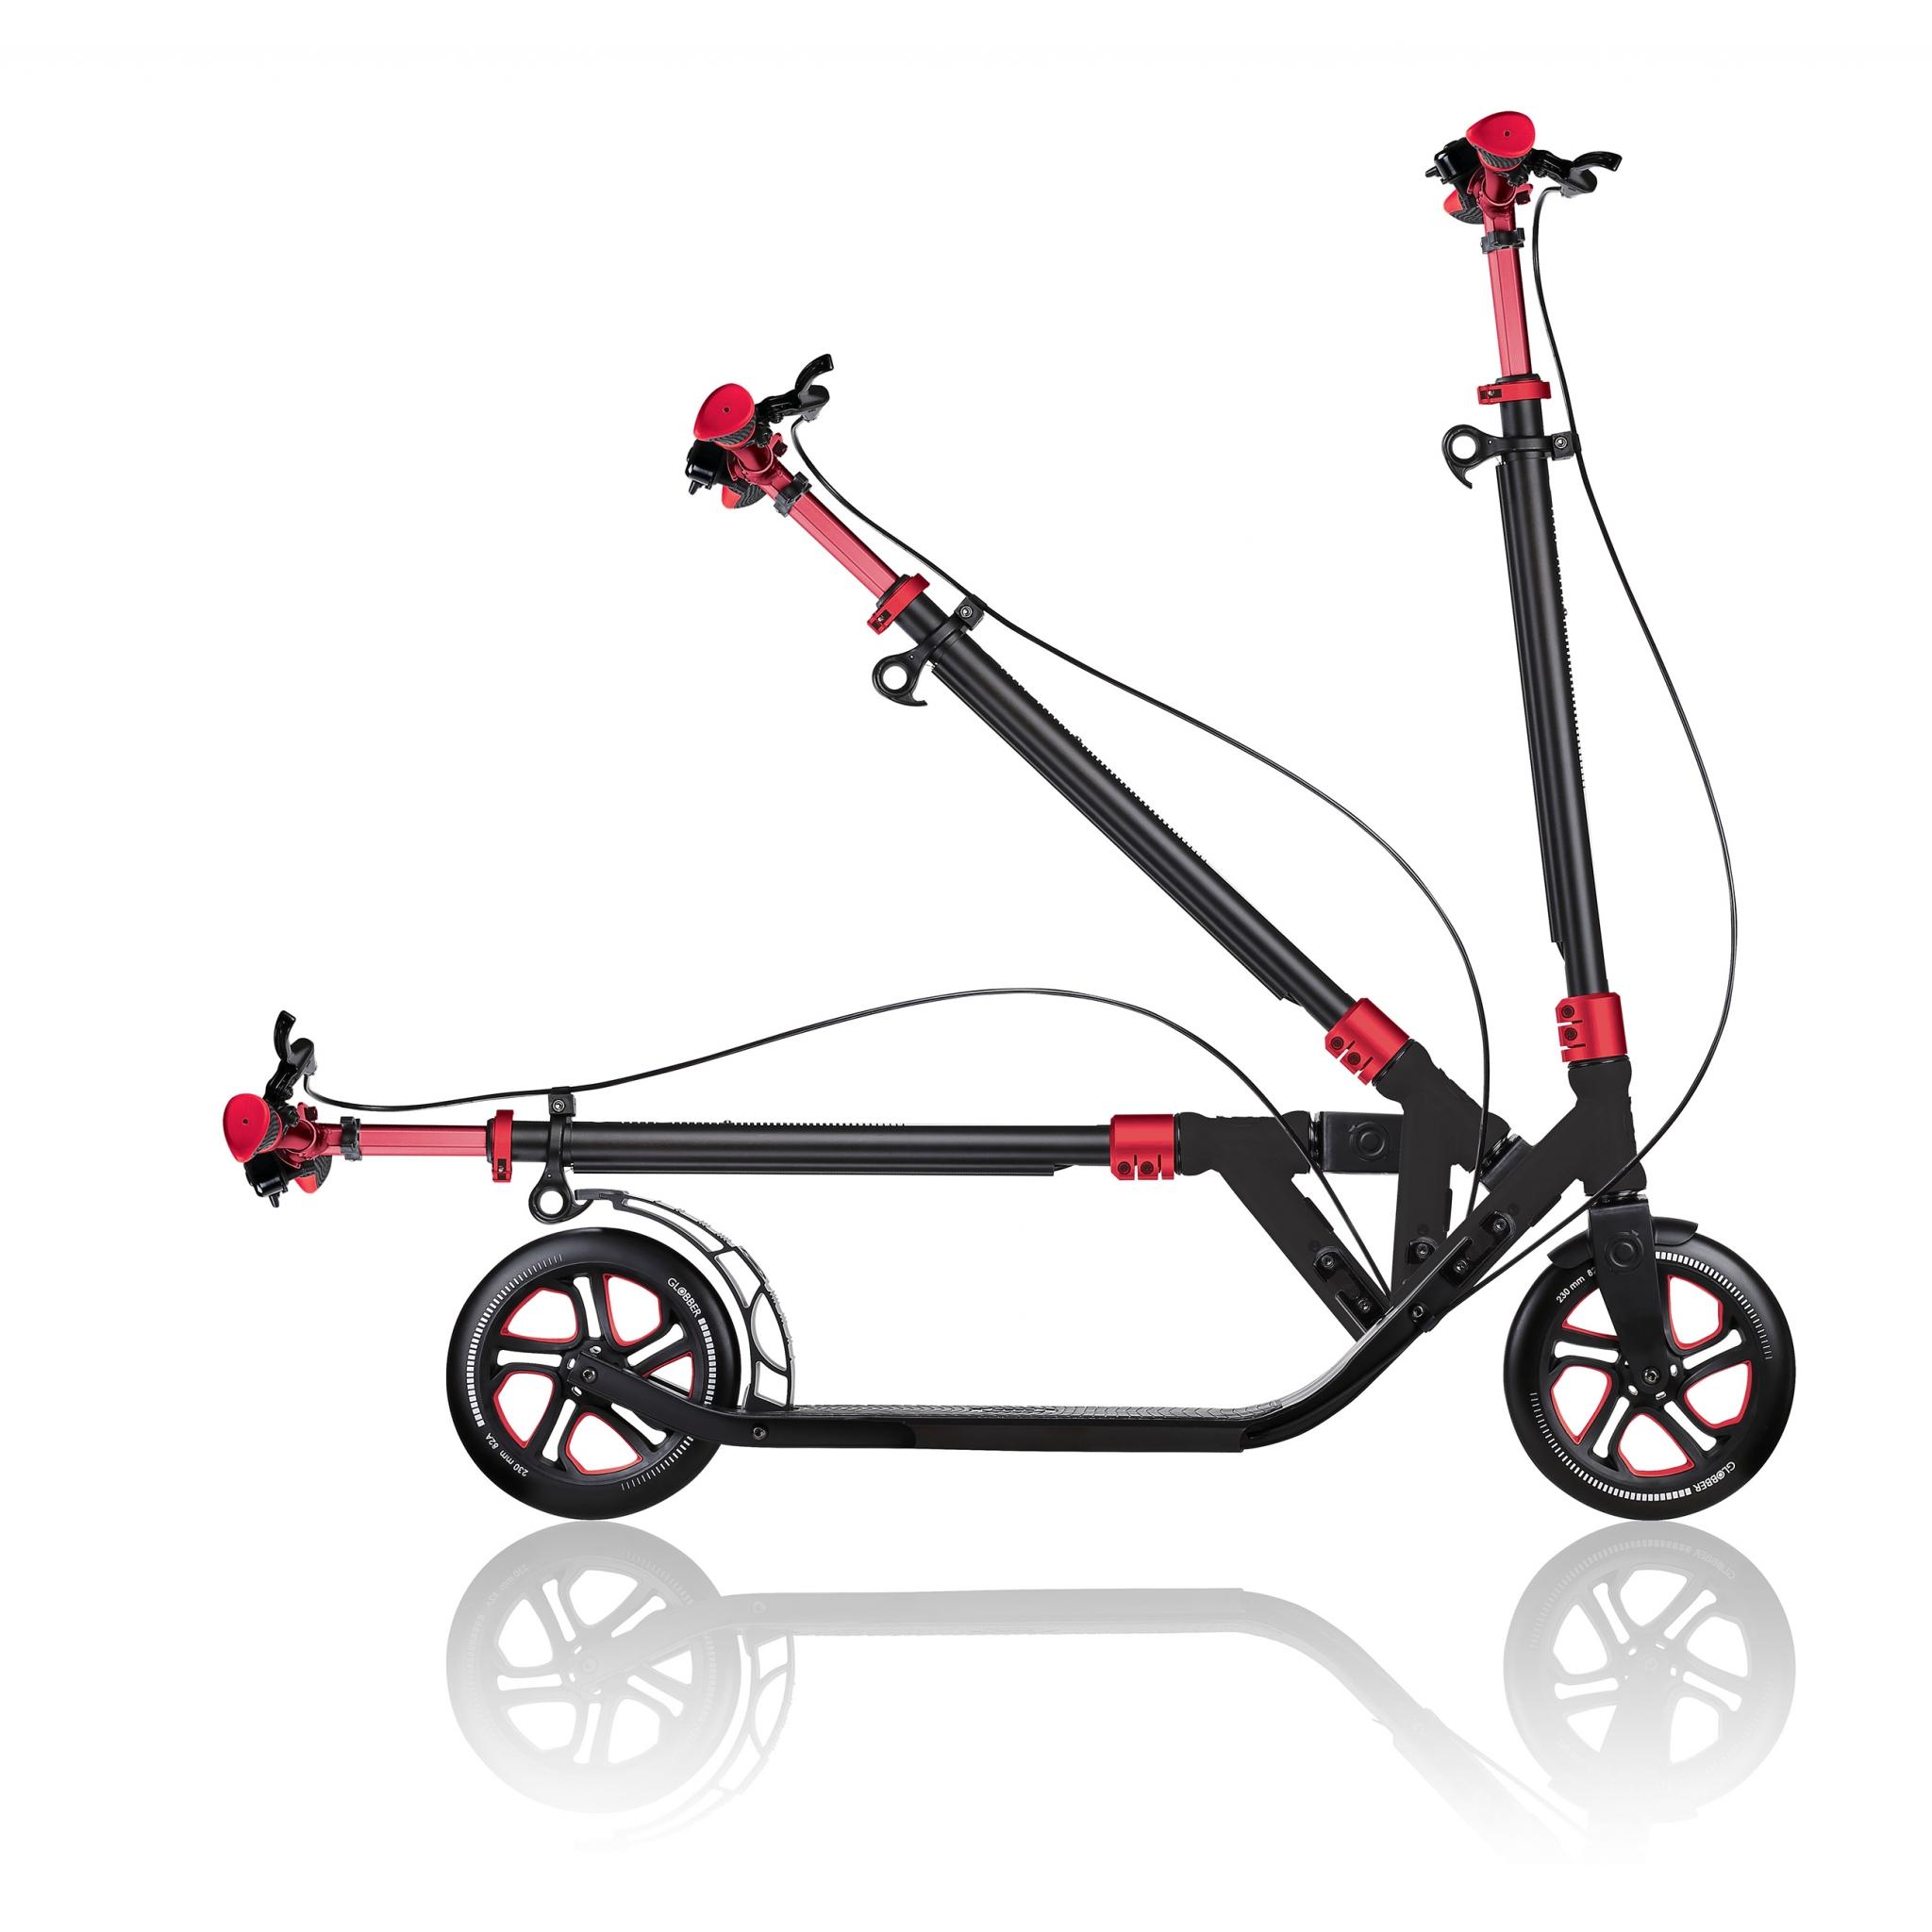 big wheel kick scooter - Globber ONE NL 230 ULTIMATE 3